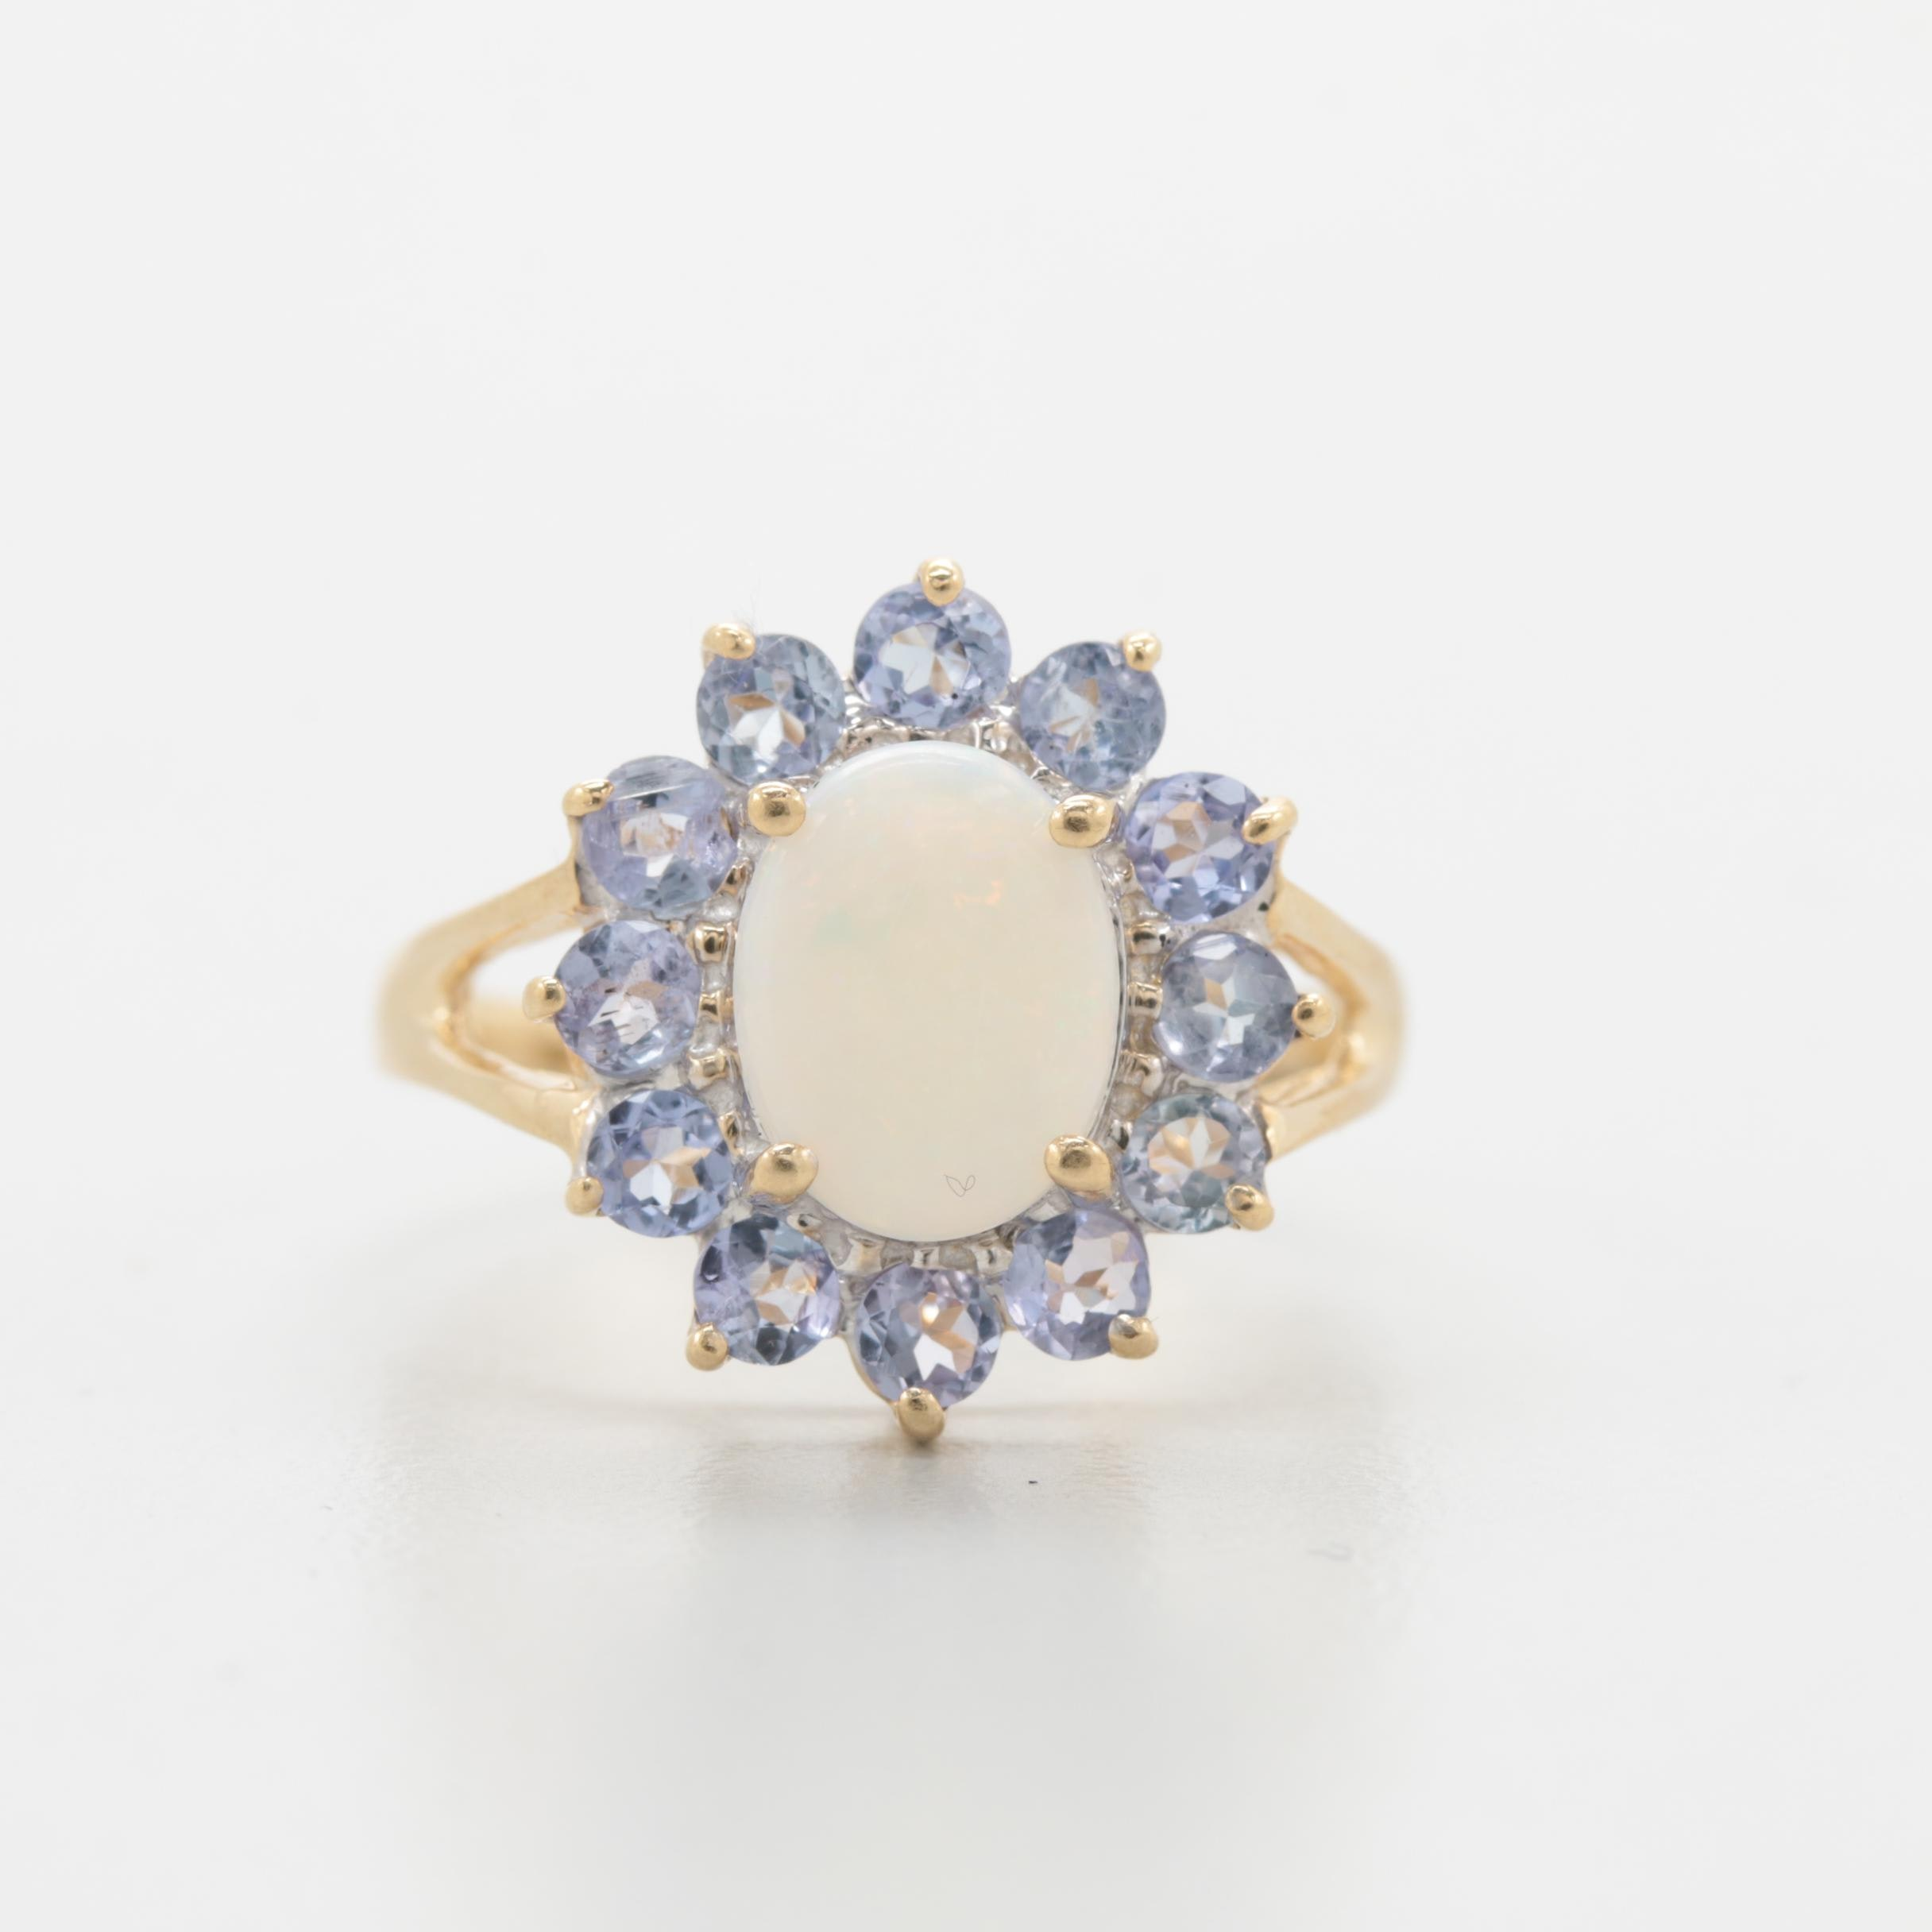 10K Yellow Gold Opal and Tanzanite Ring